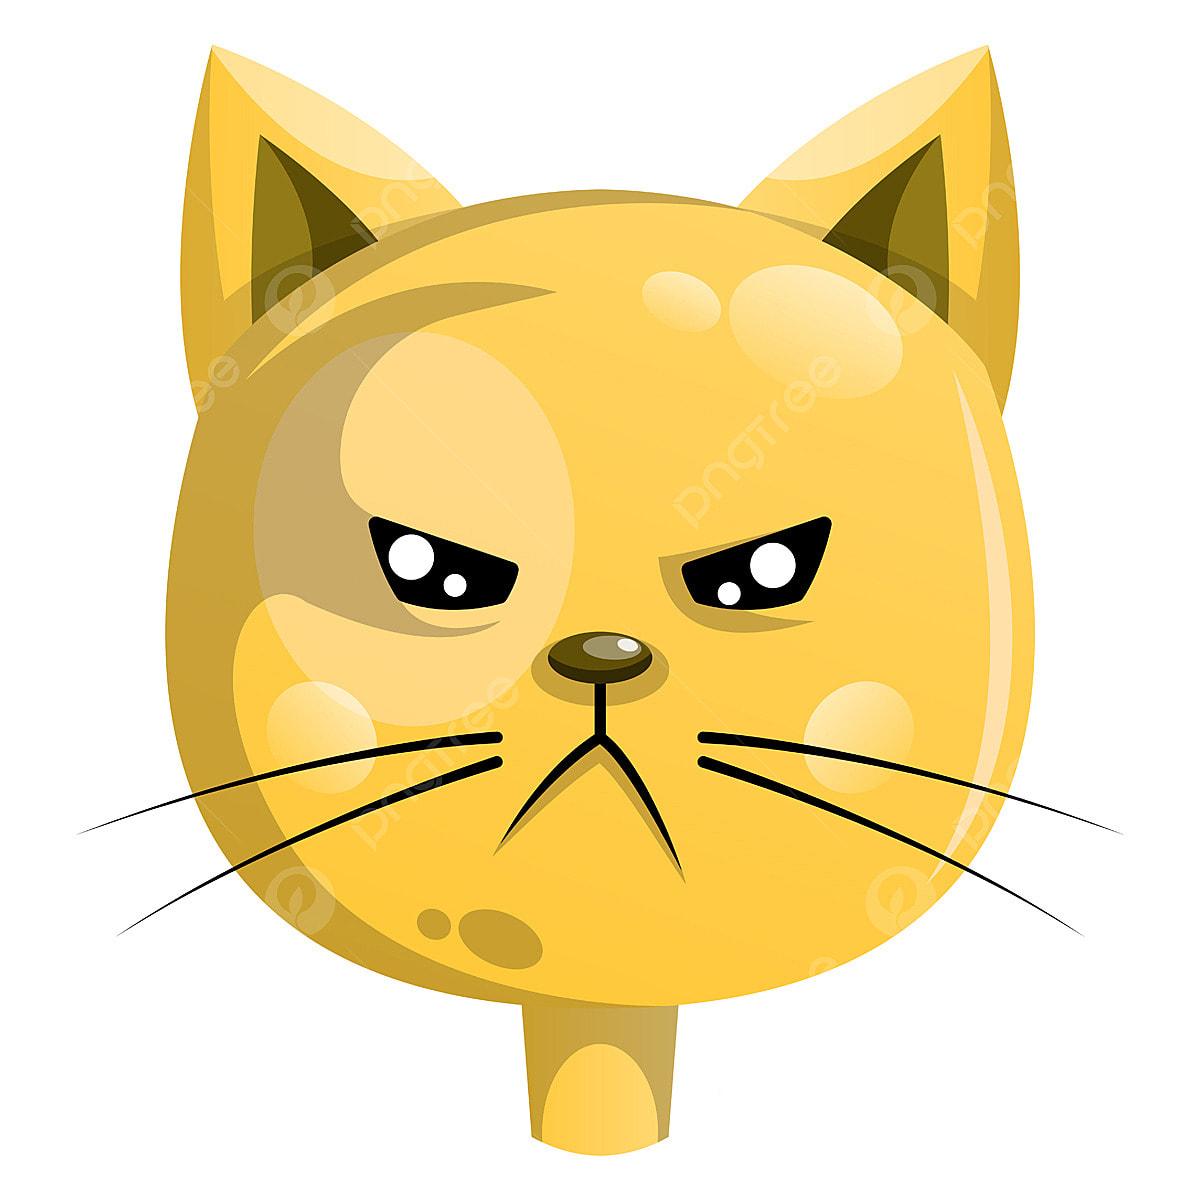 Ilustracao Em Vetor Gato Bravo Amarelo Sobre Fundo Branco Animal